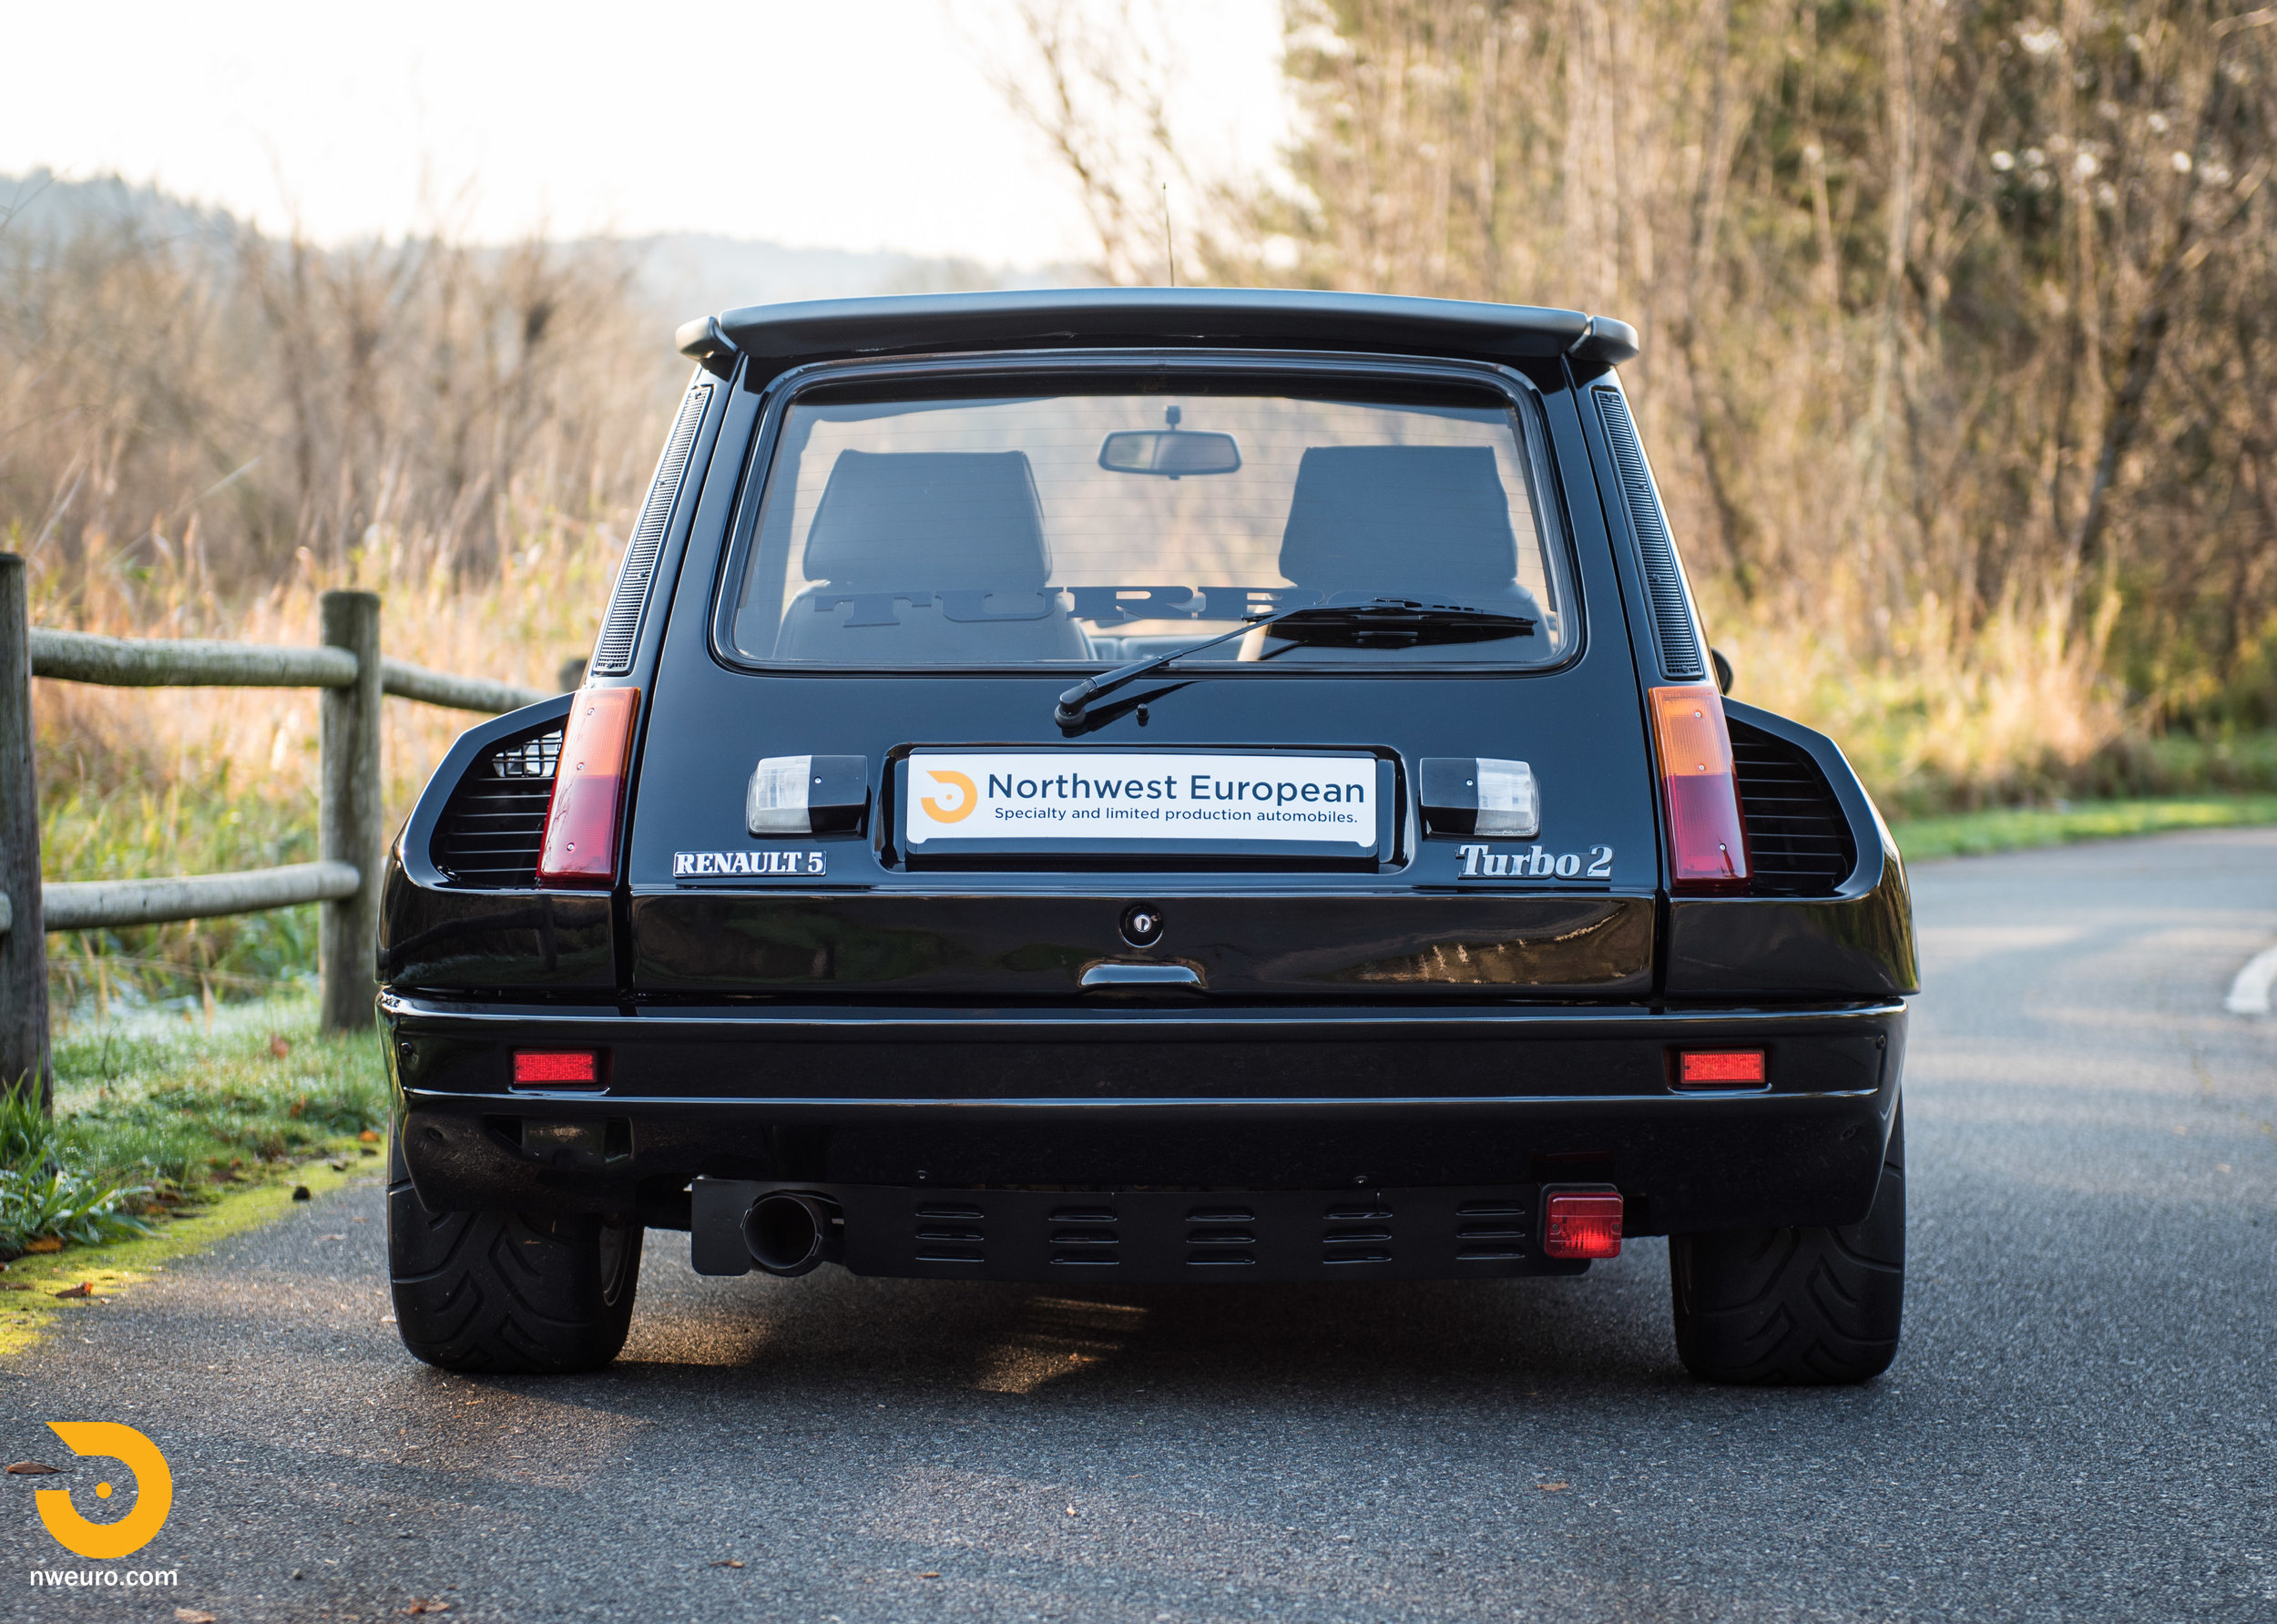 1983 Renault R5 Turbo 2 Black at Park-2.jpg